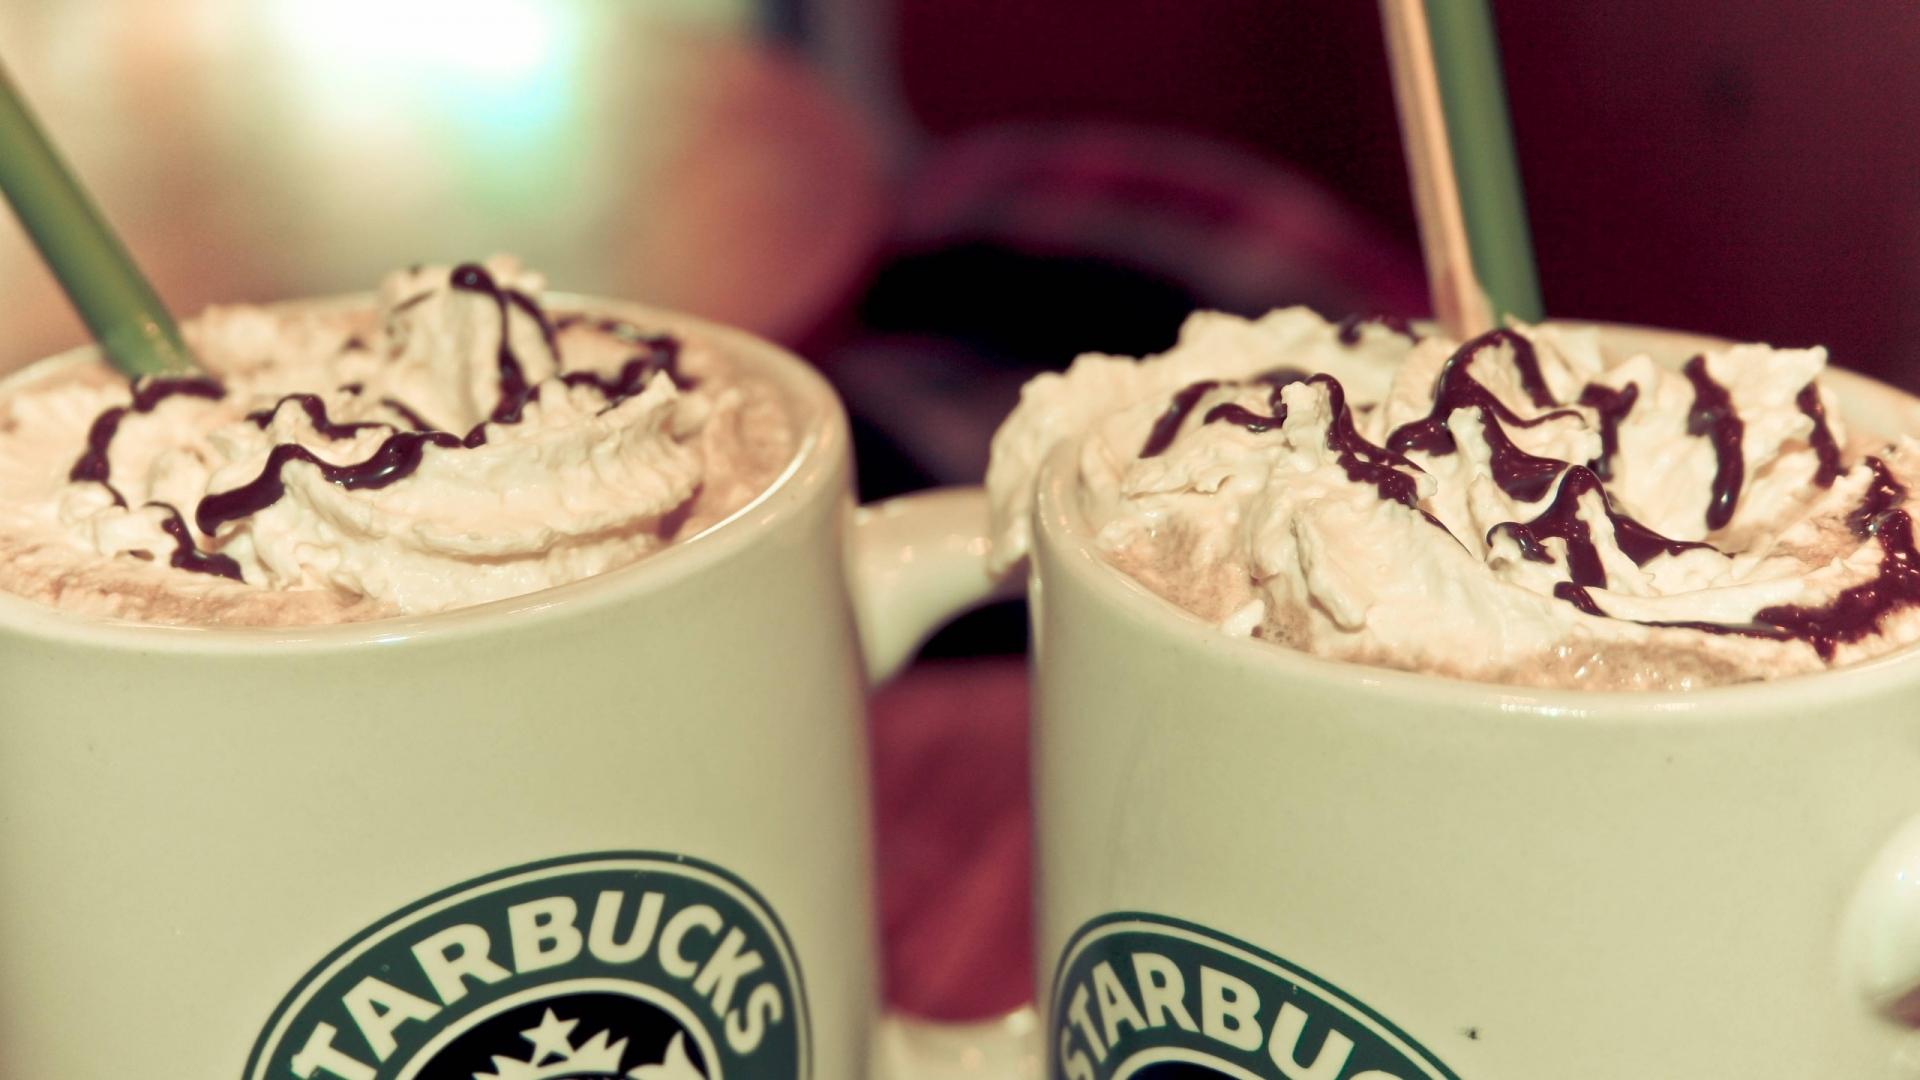 Full-HD-1080p-Starbucks-HD-Desktop-Backgrounds-wallpaper-wpc5805212